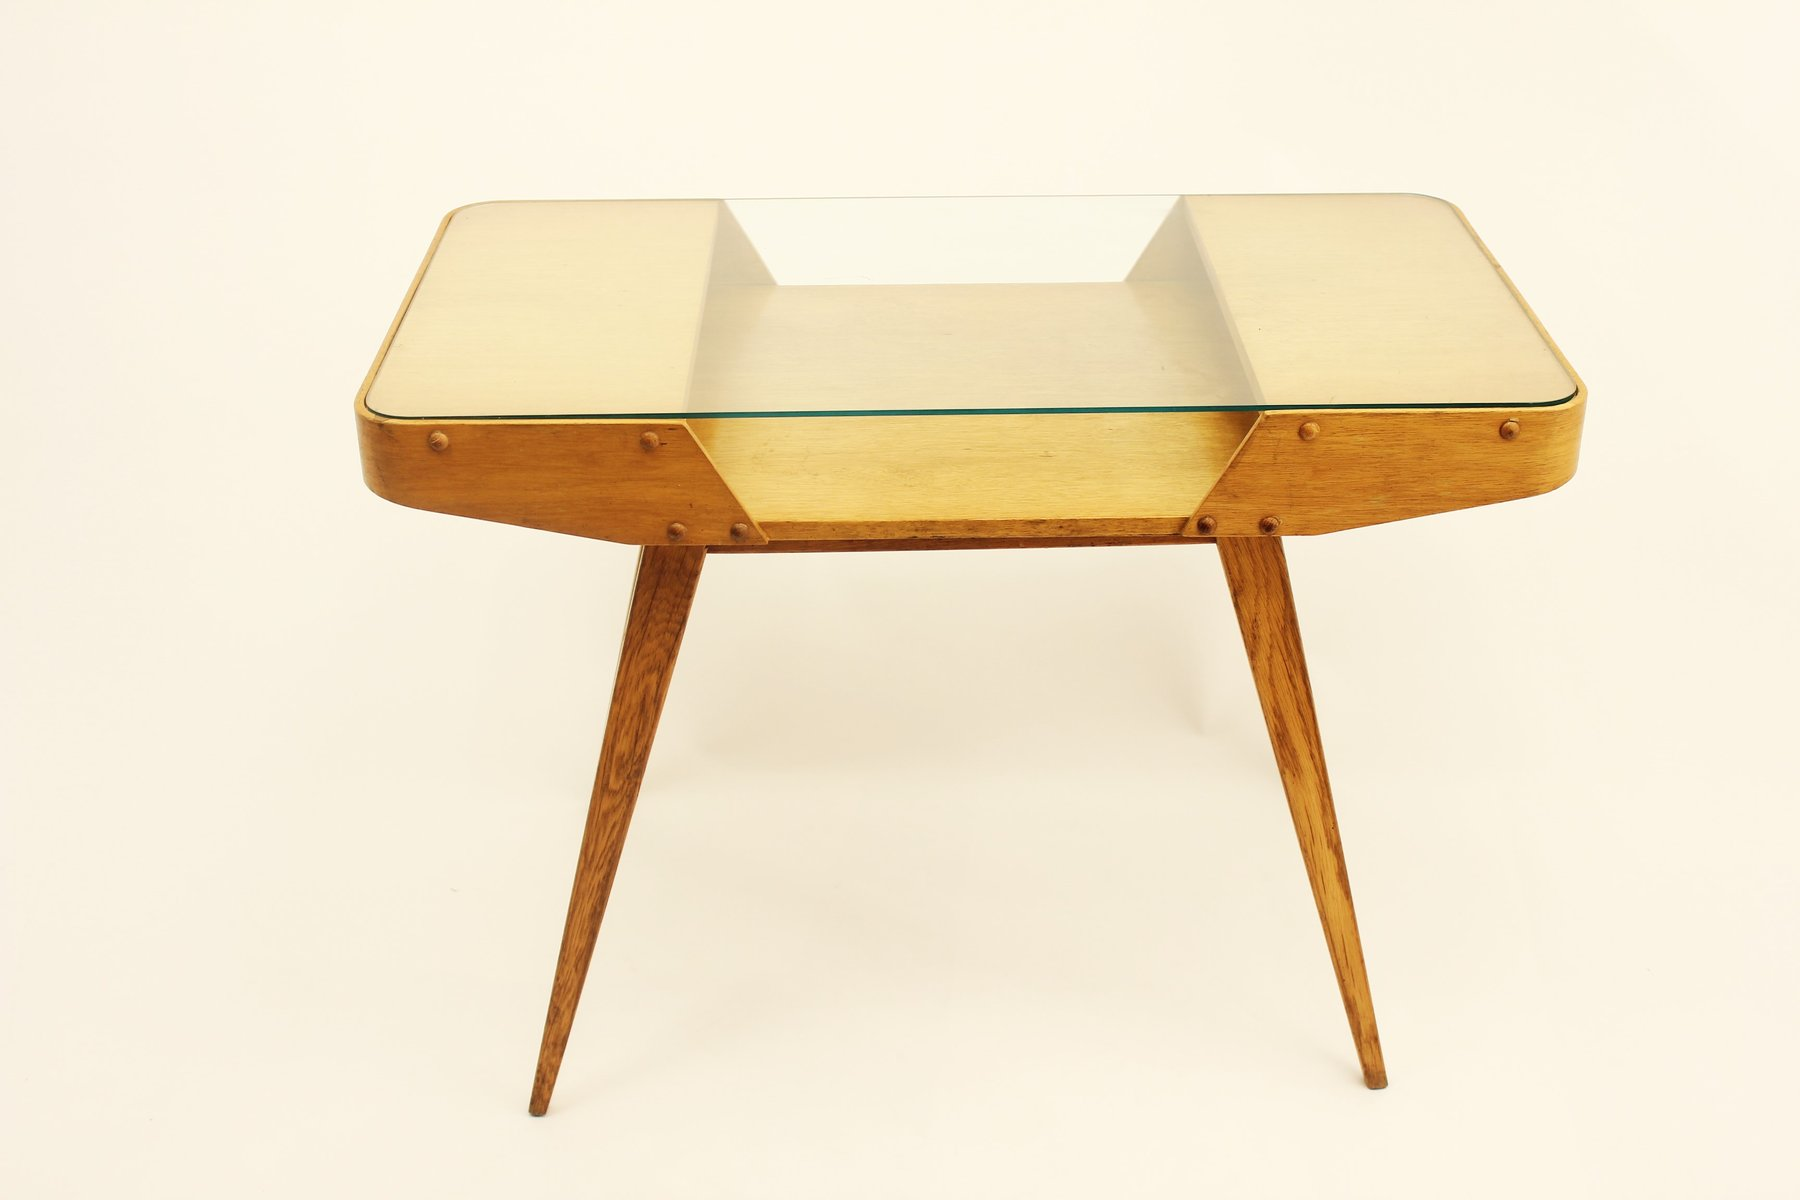 Vintage Czechoslovakian Oak Coffee Table With Glass Top